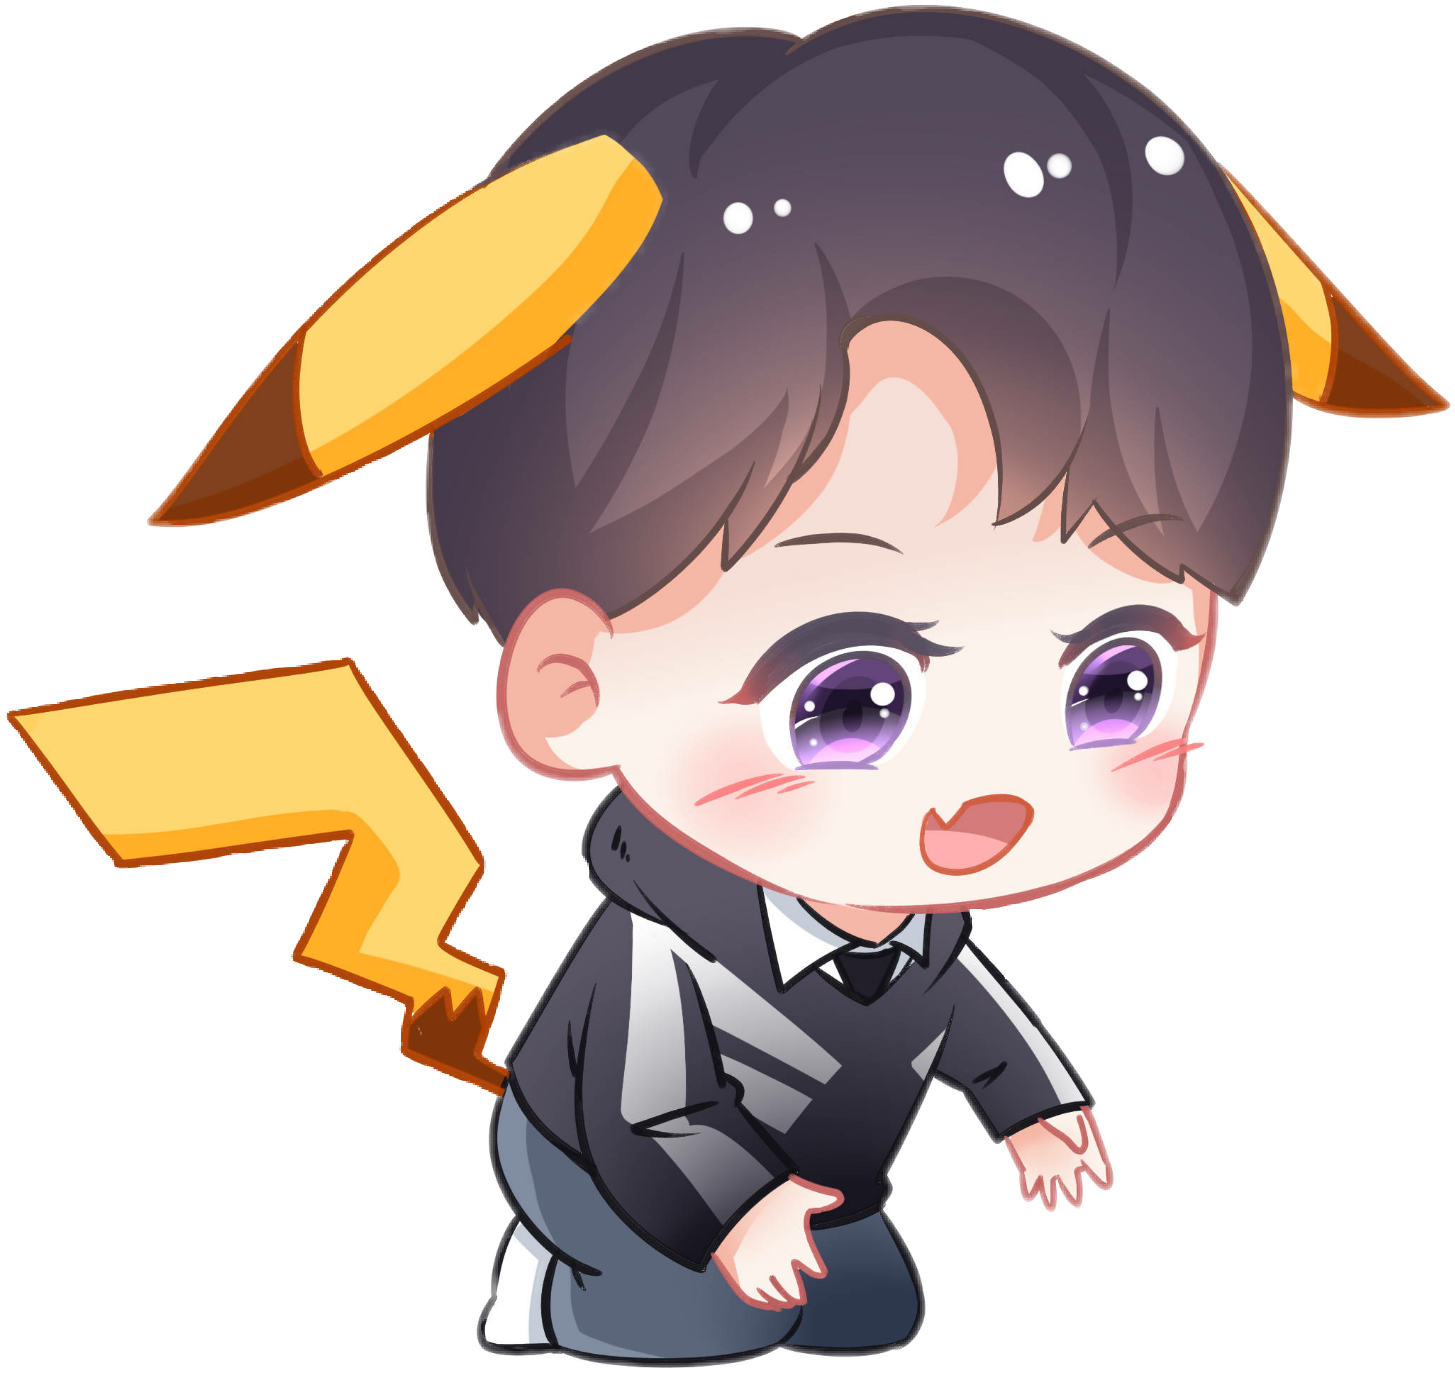 Tfboys 王俊凯 Wangjunkai Chibi Pikachu